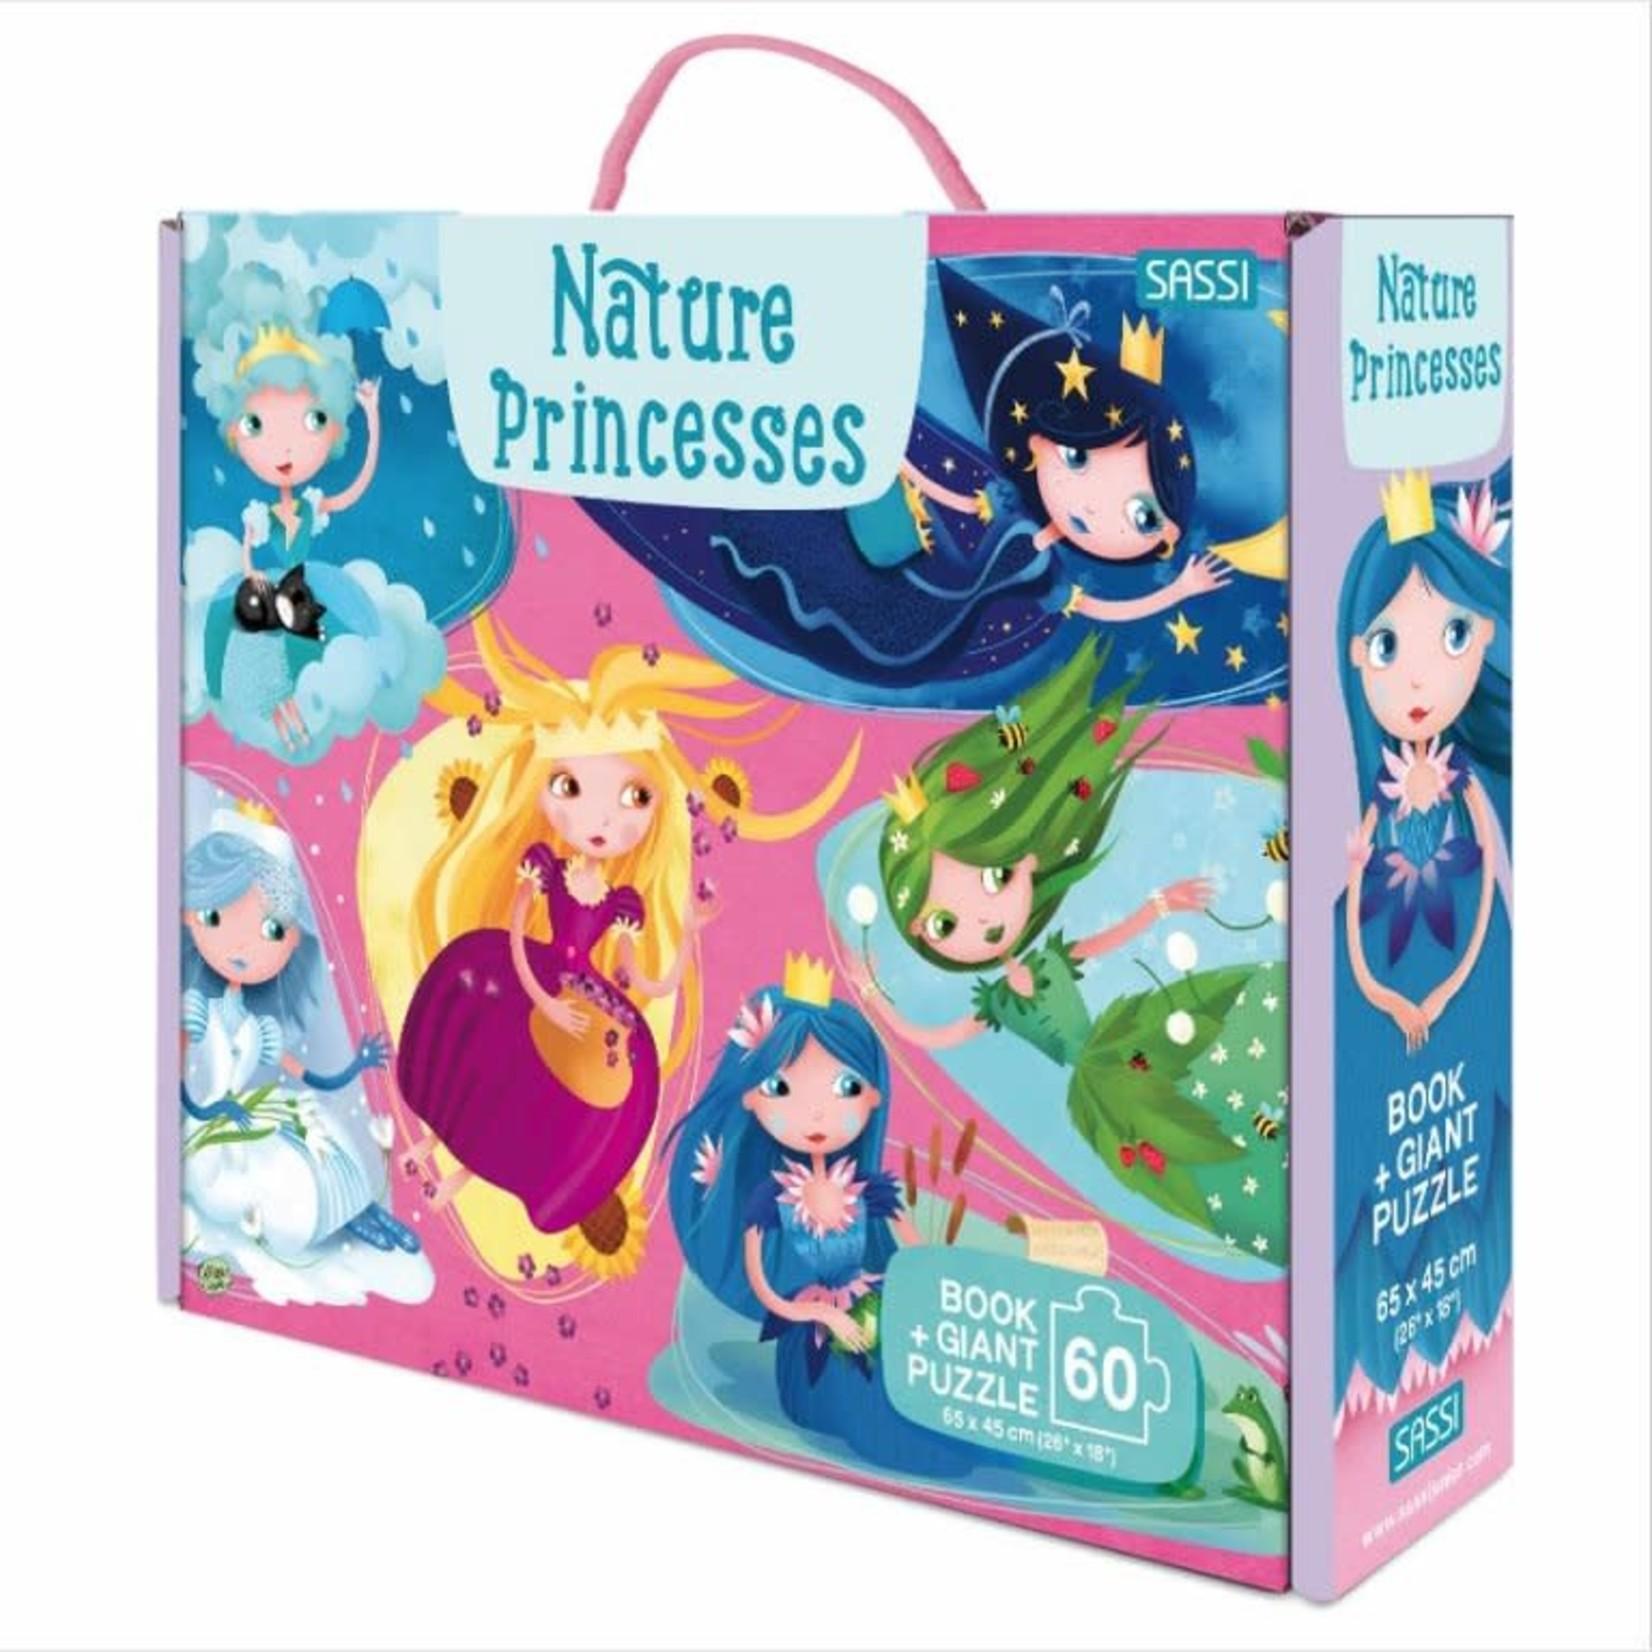 Sassi Sassi Nature Princess Book & Giant Puzzle